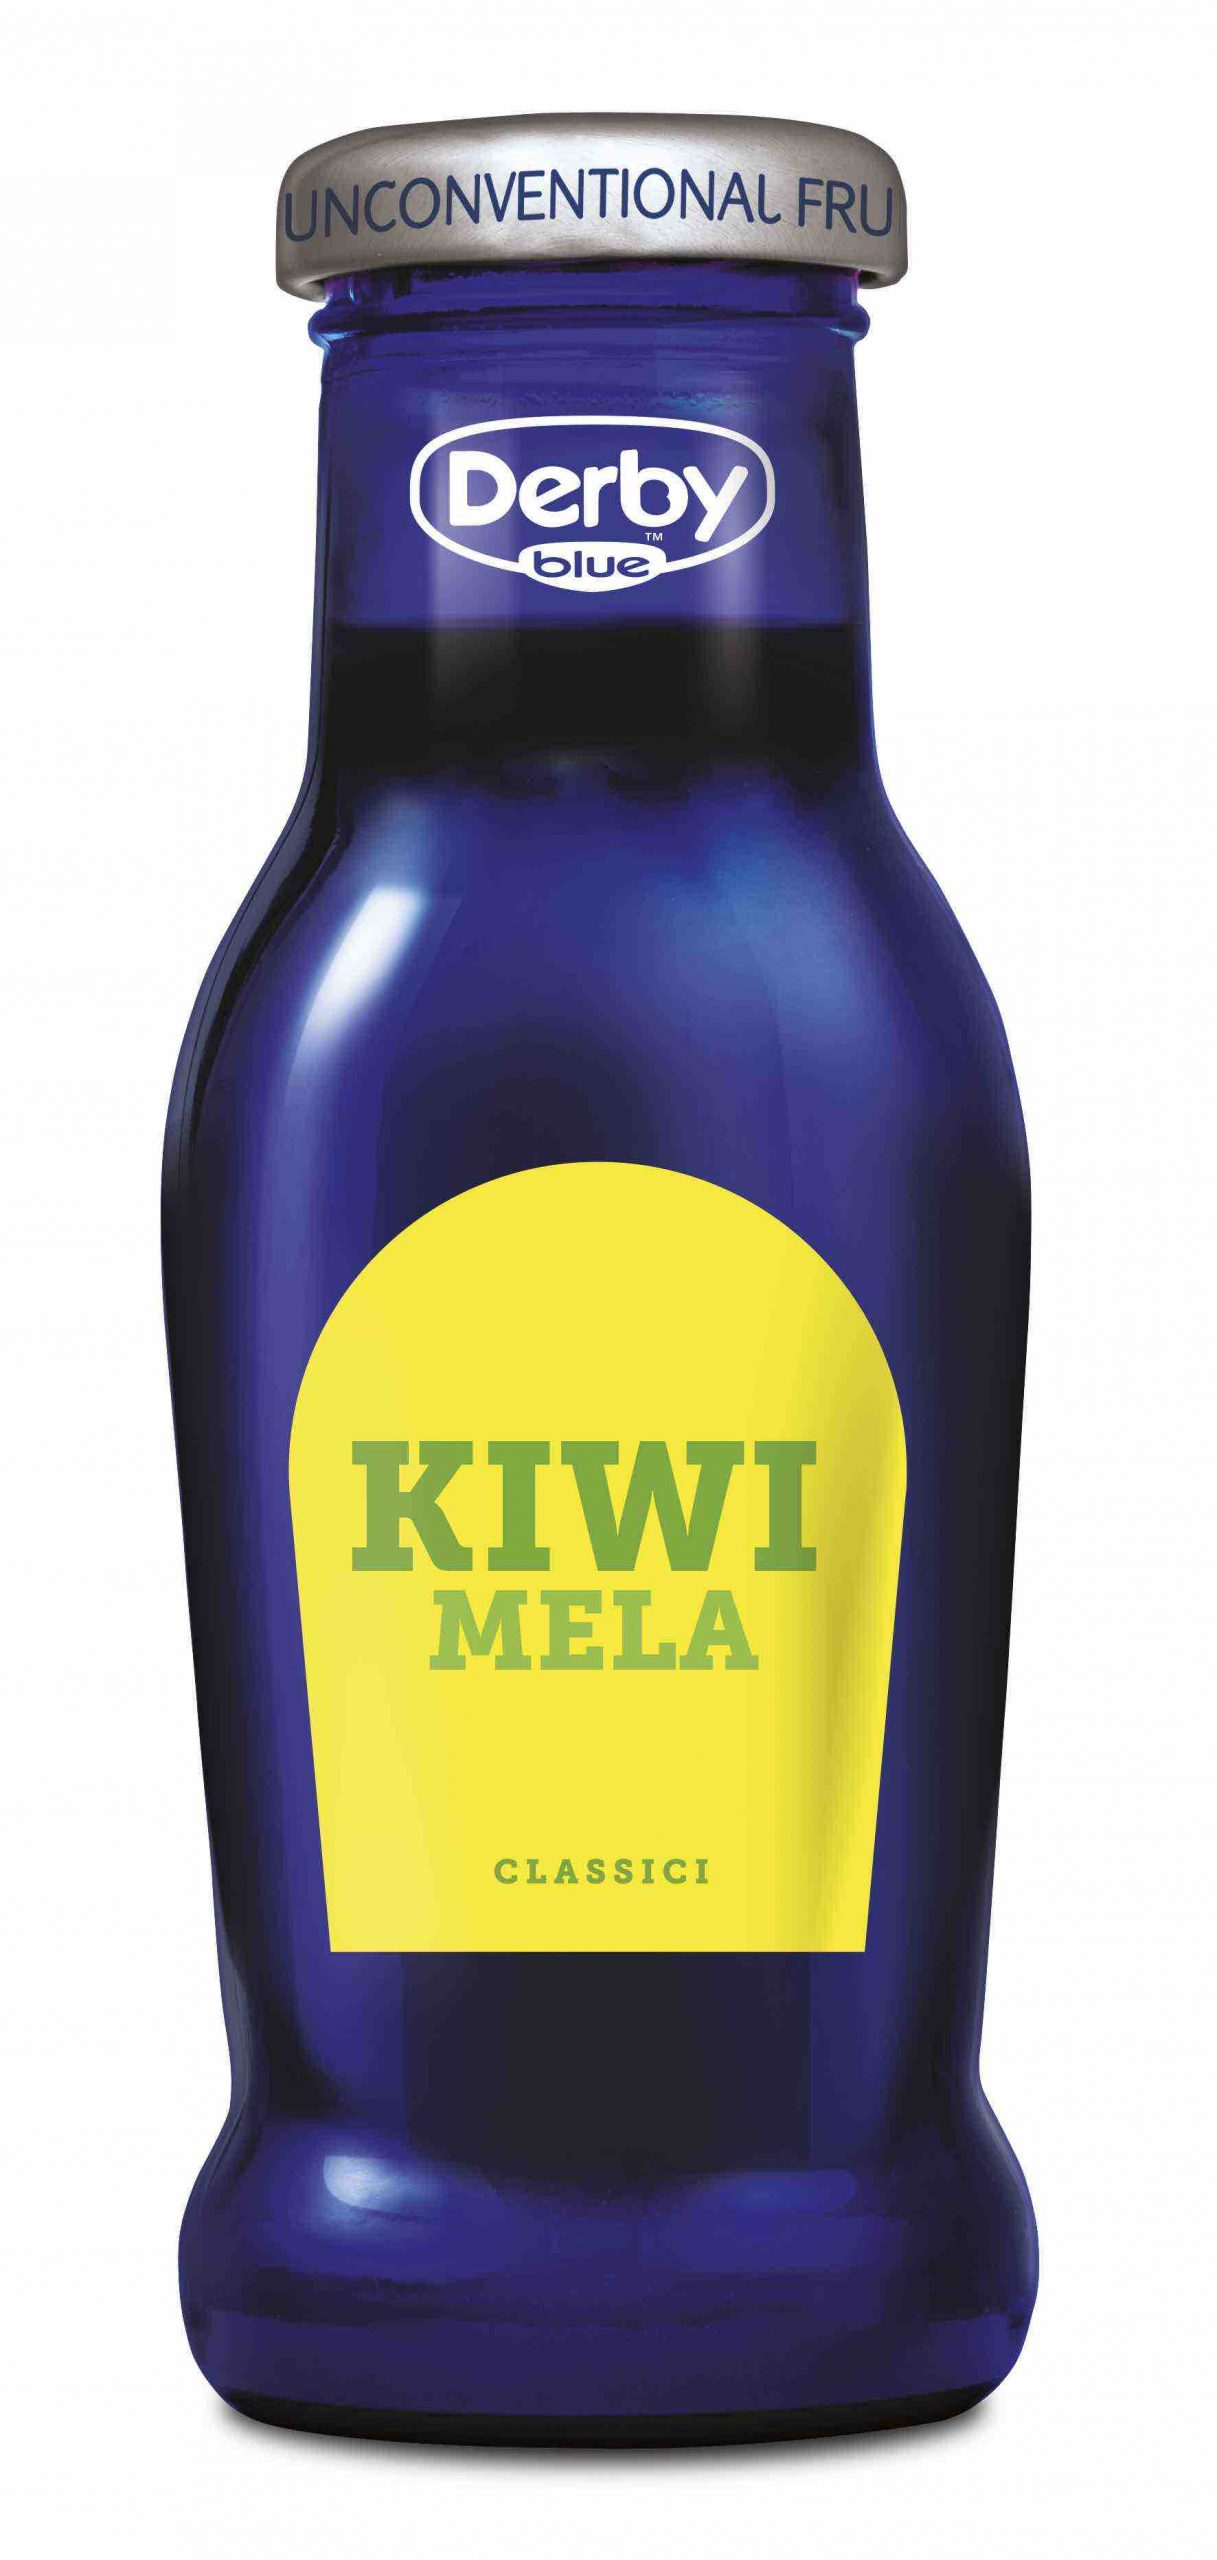 Derby Blu Kiwi Mela, la bottiglia in vetro in primo piano